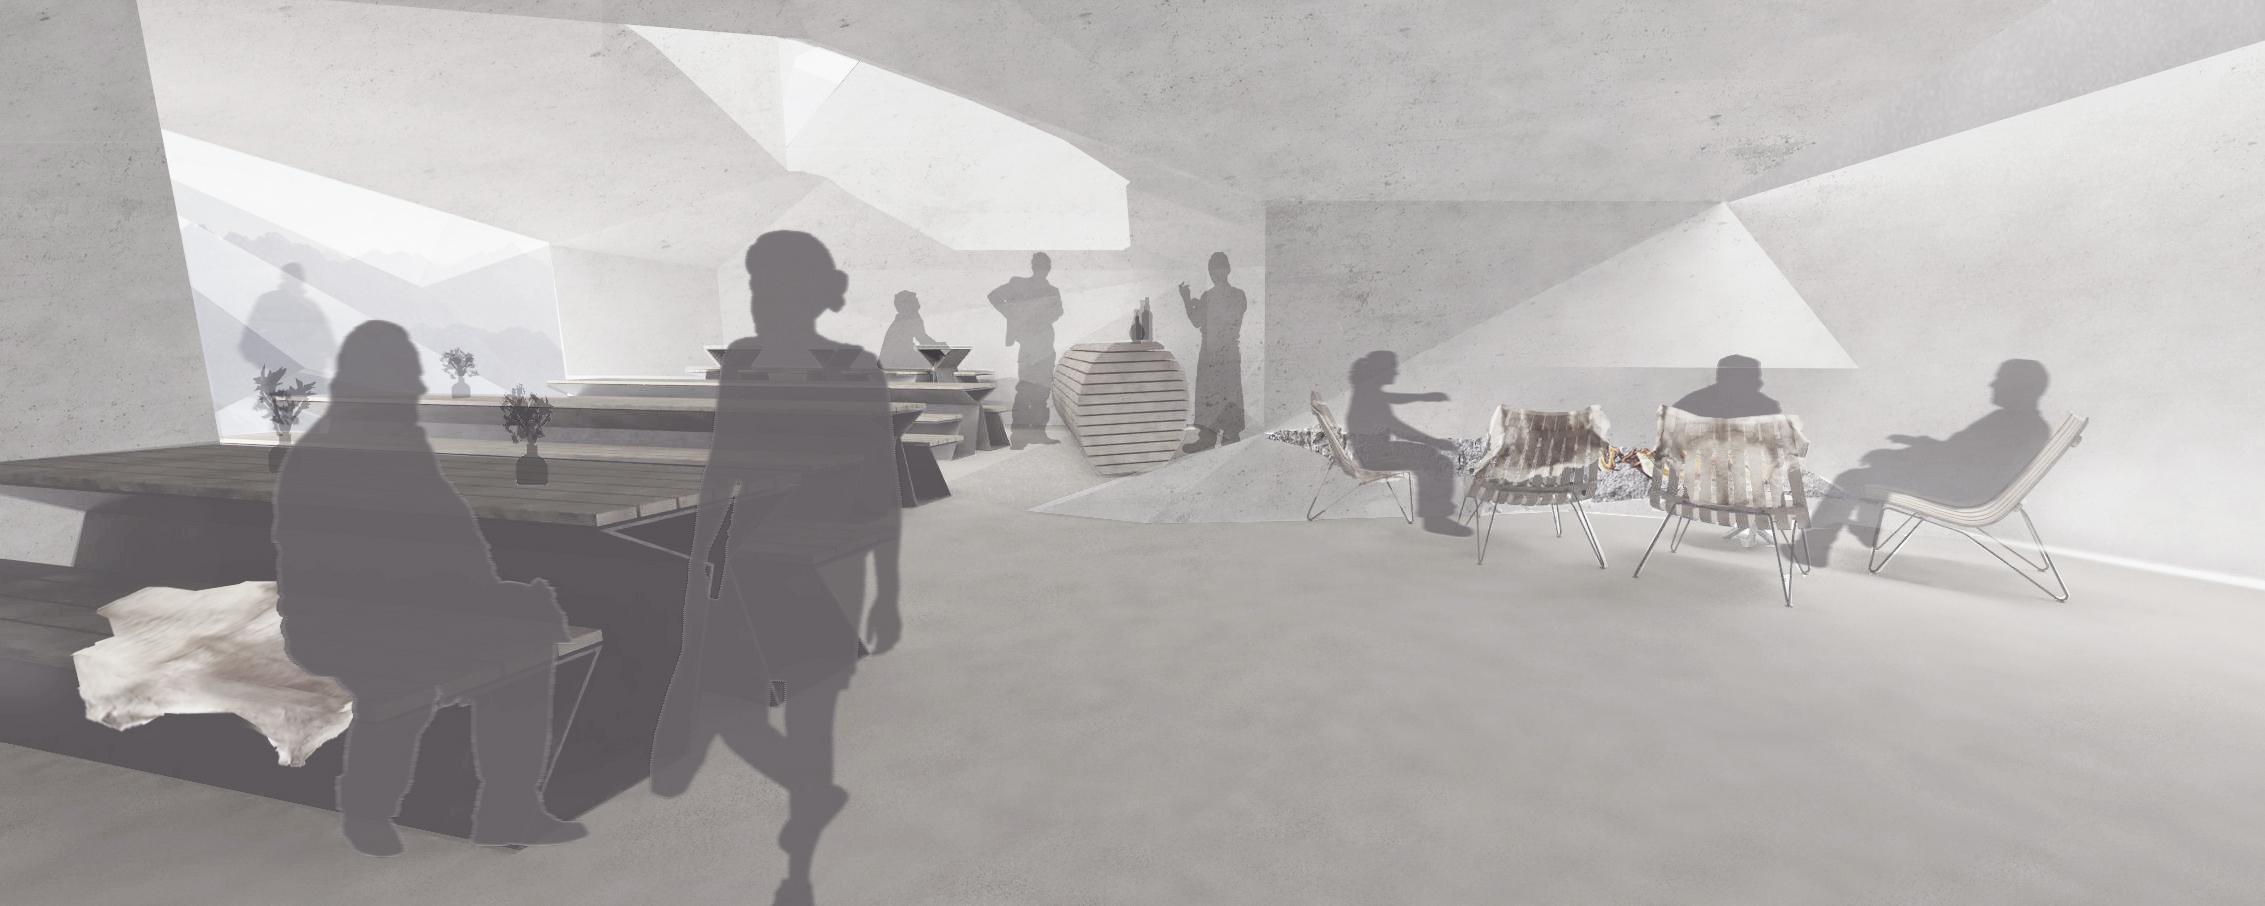 Michael-Becker-Architects-Architekten-Gipfelstation-Nebelhorn-Perspektive-K07